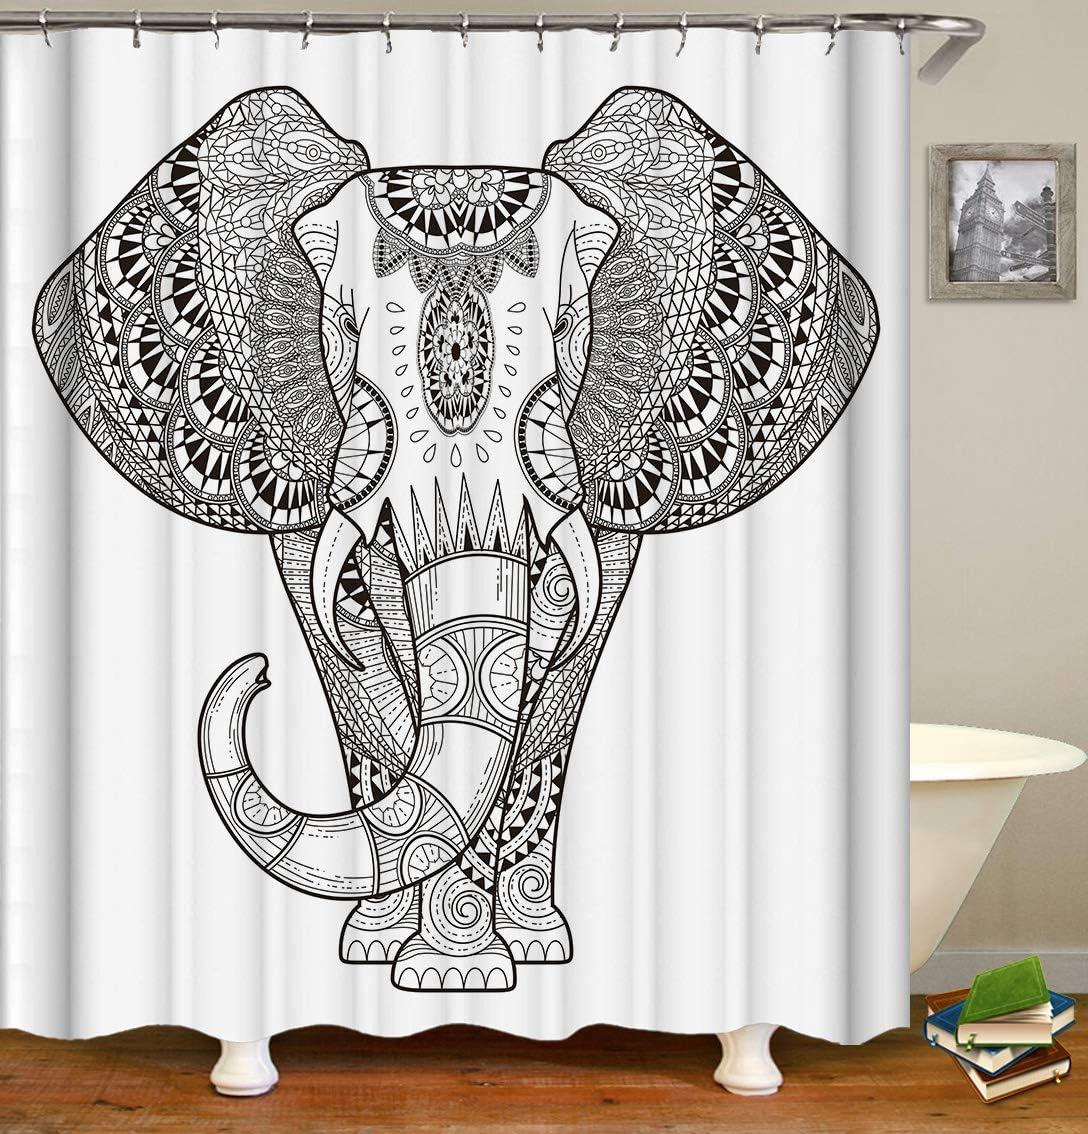 Fabric Shower Curtain,Elephant Ethnic Indian Mandala Floral Paisley Sacred Animal Unique White Polyester Designer Cloth, Print Decorative Bathroom Curtains Include Hooks Set